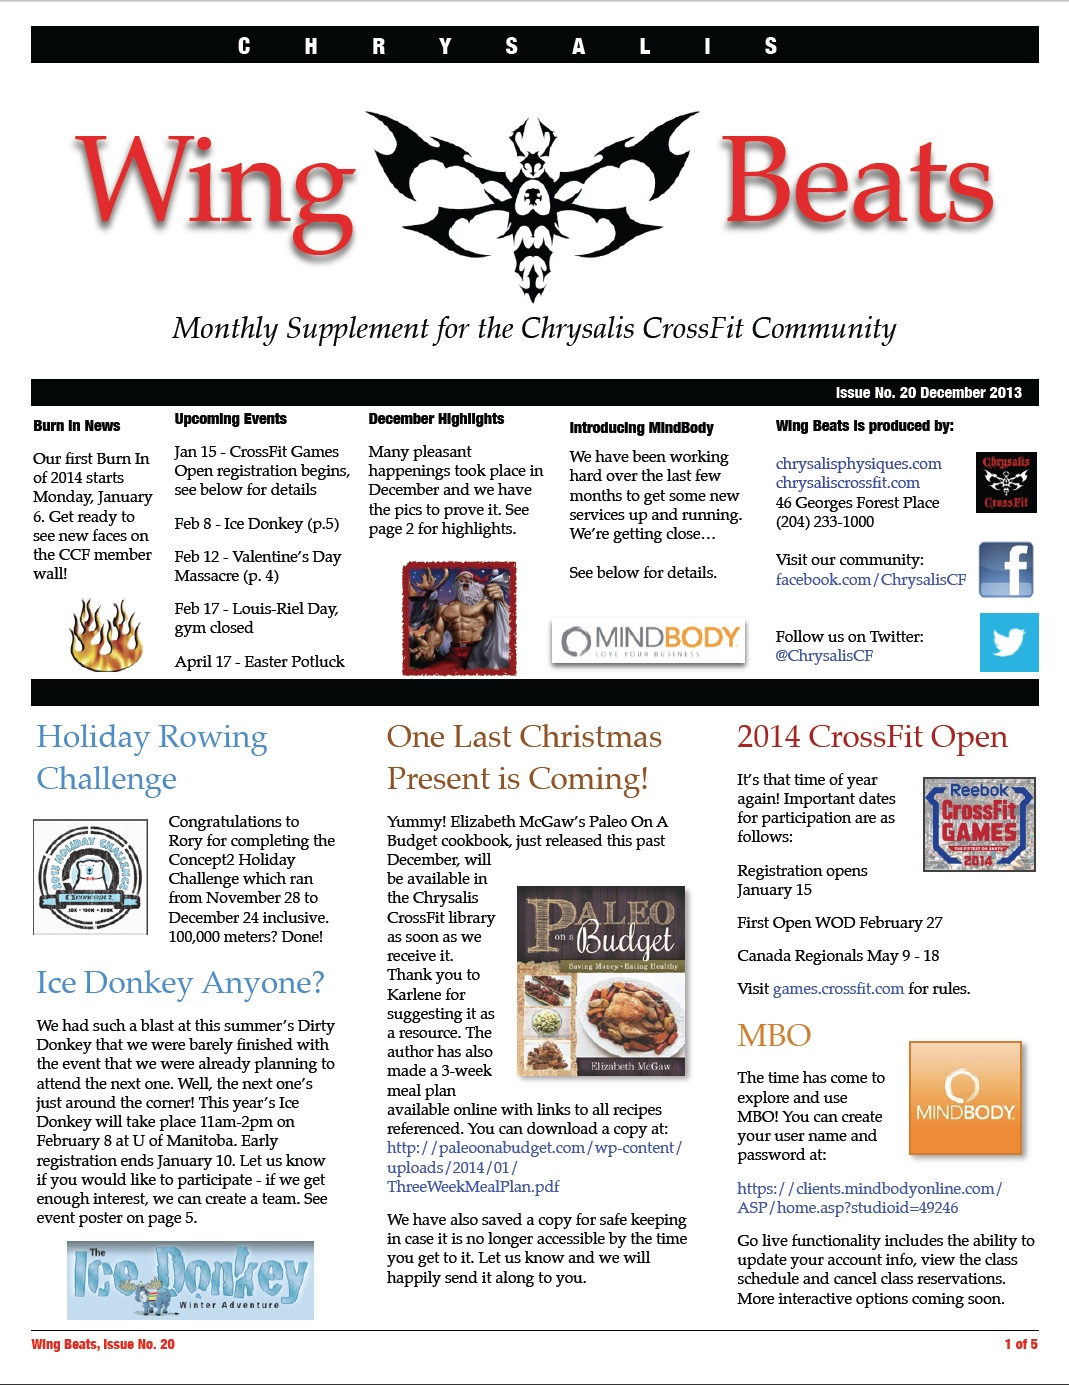 WingBeats Issue #20 - December 2013